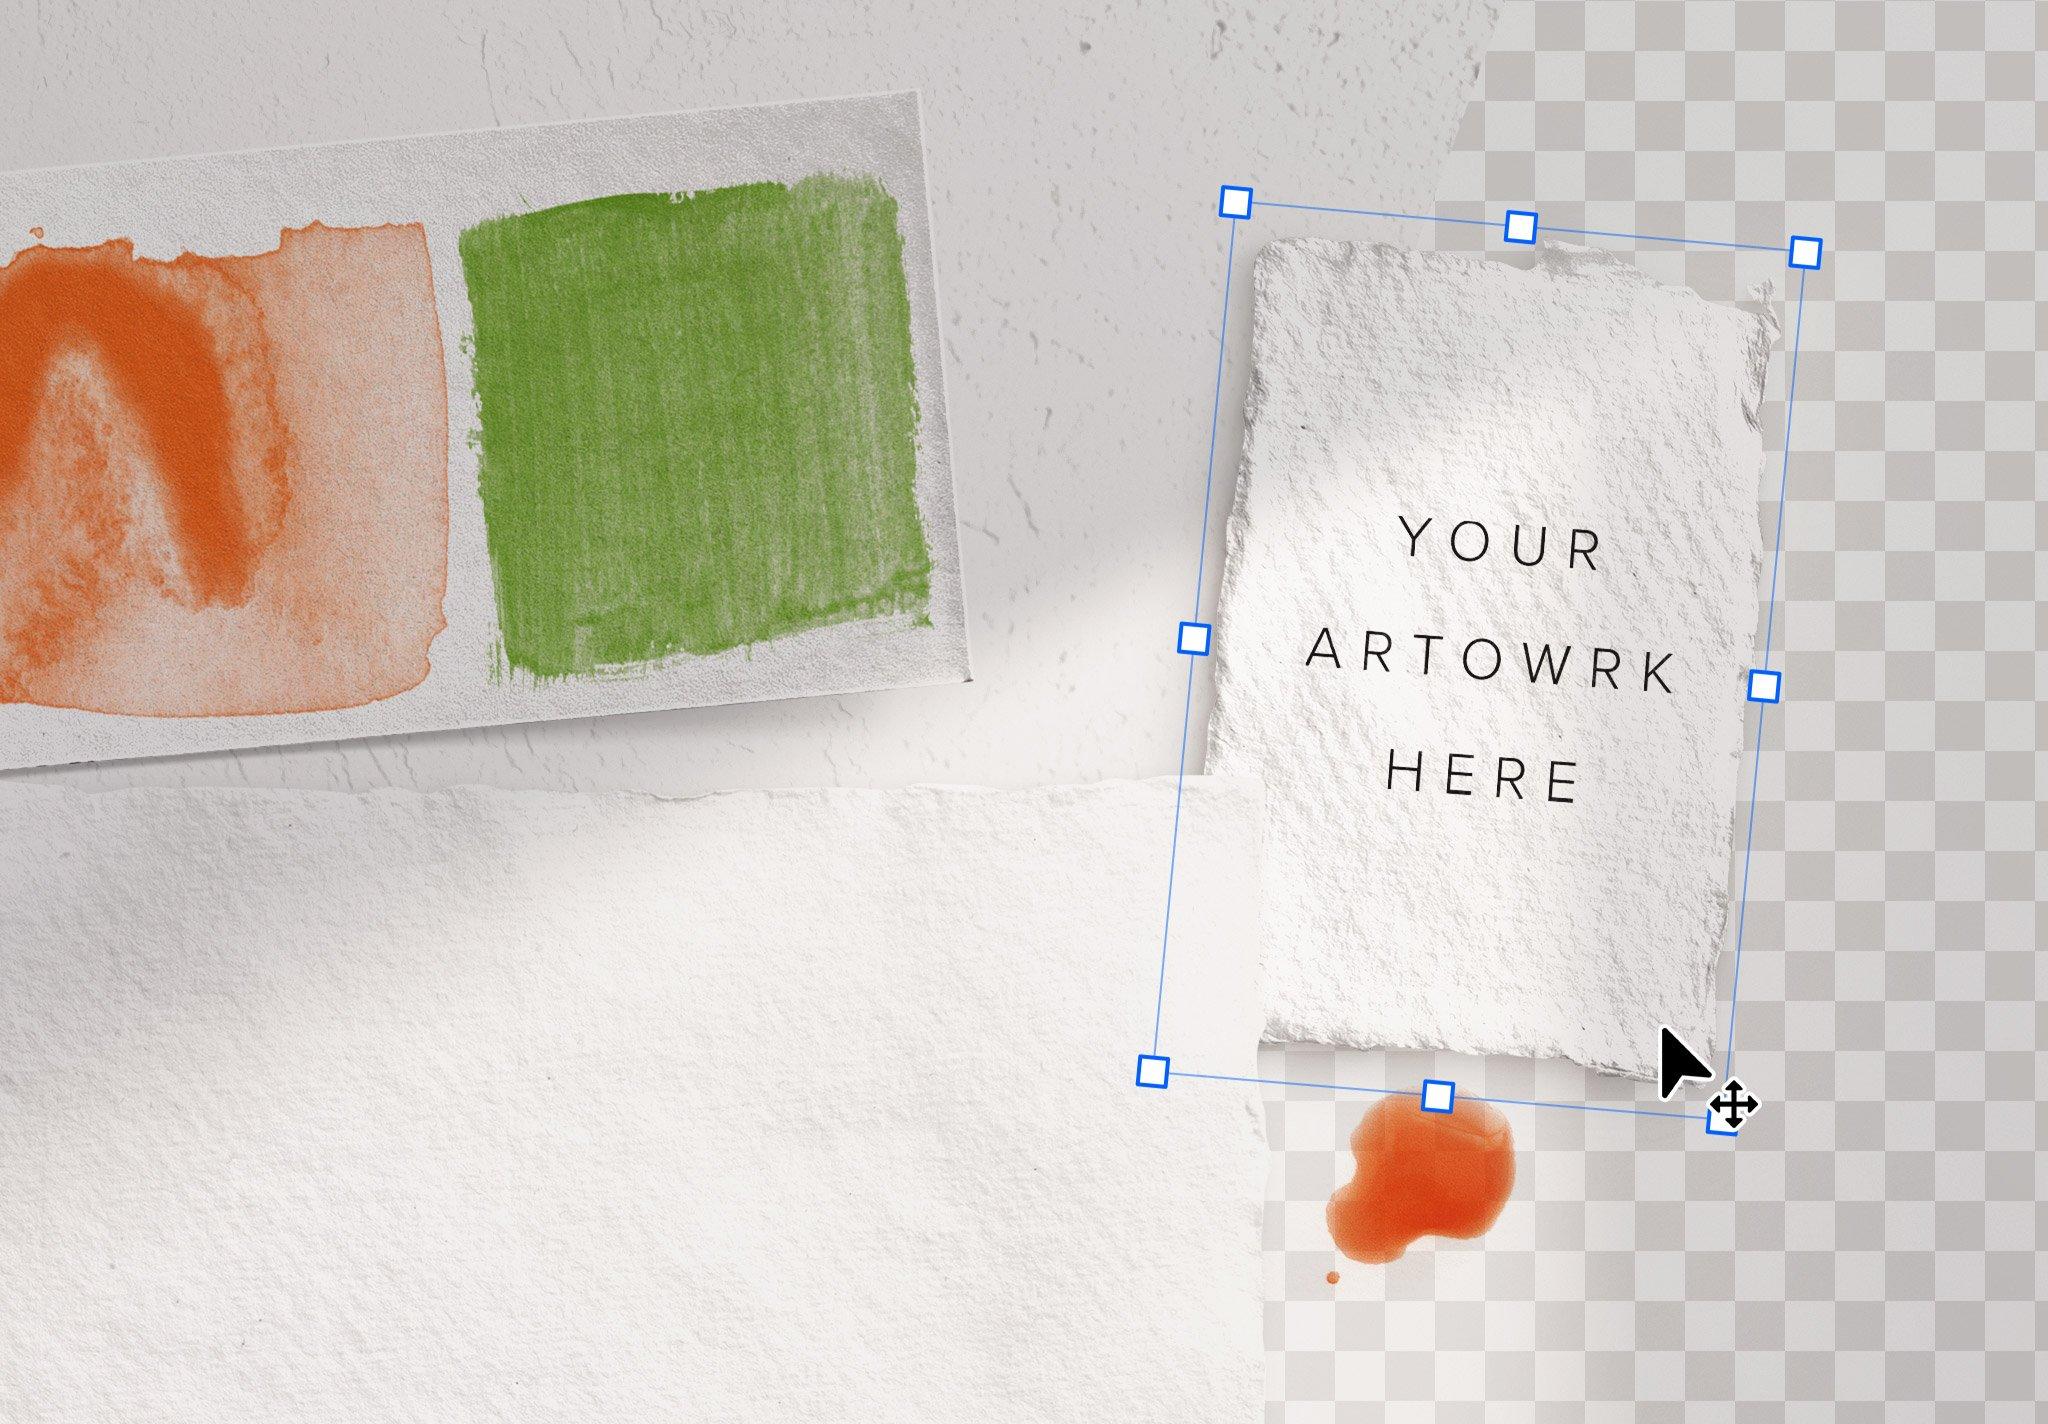 watercolor mockup scene creator 1 image01 1